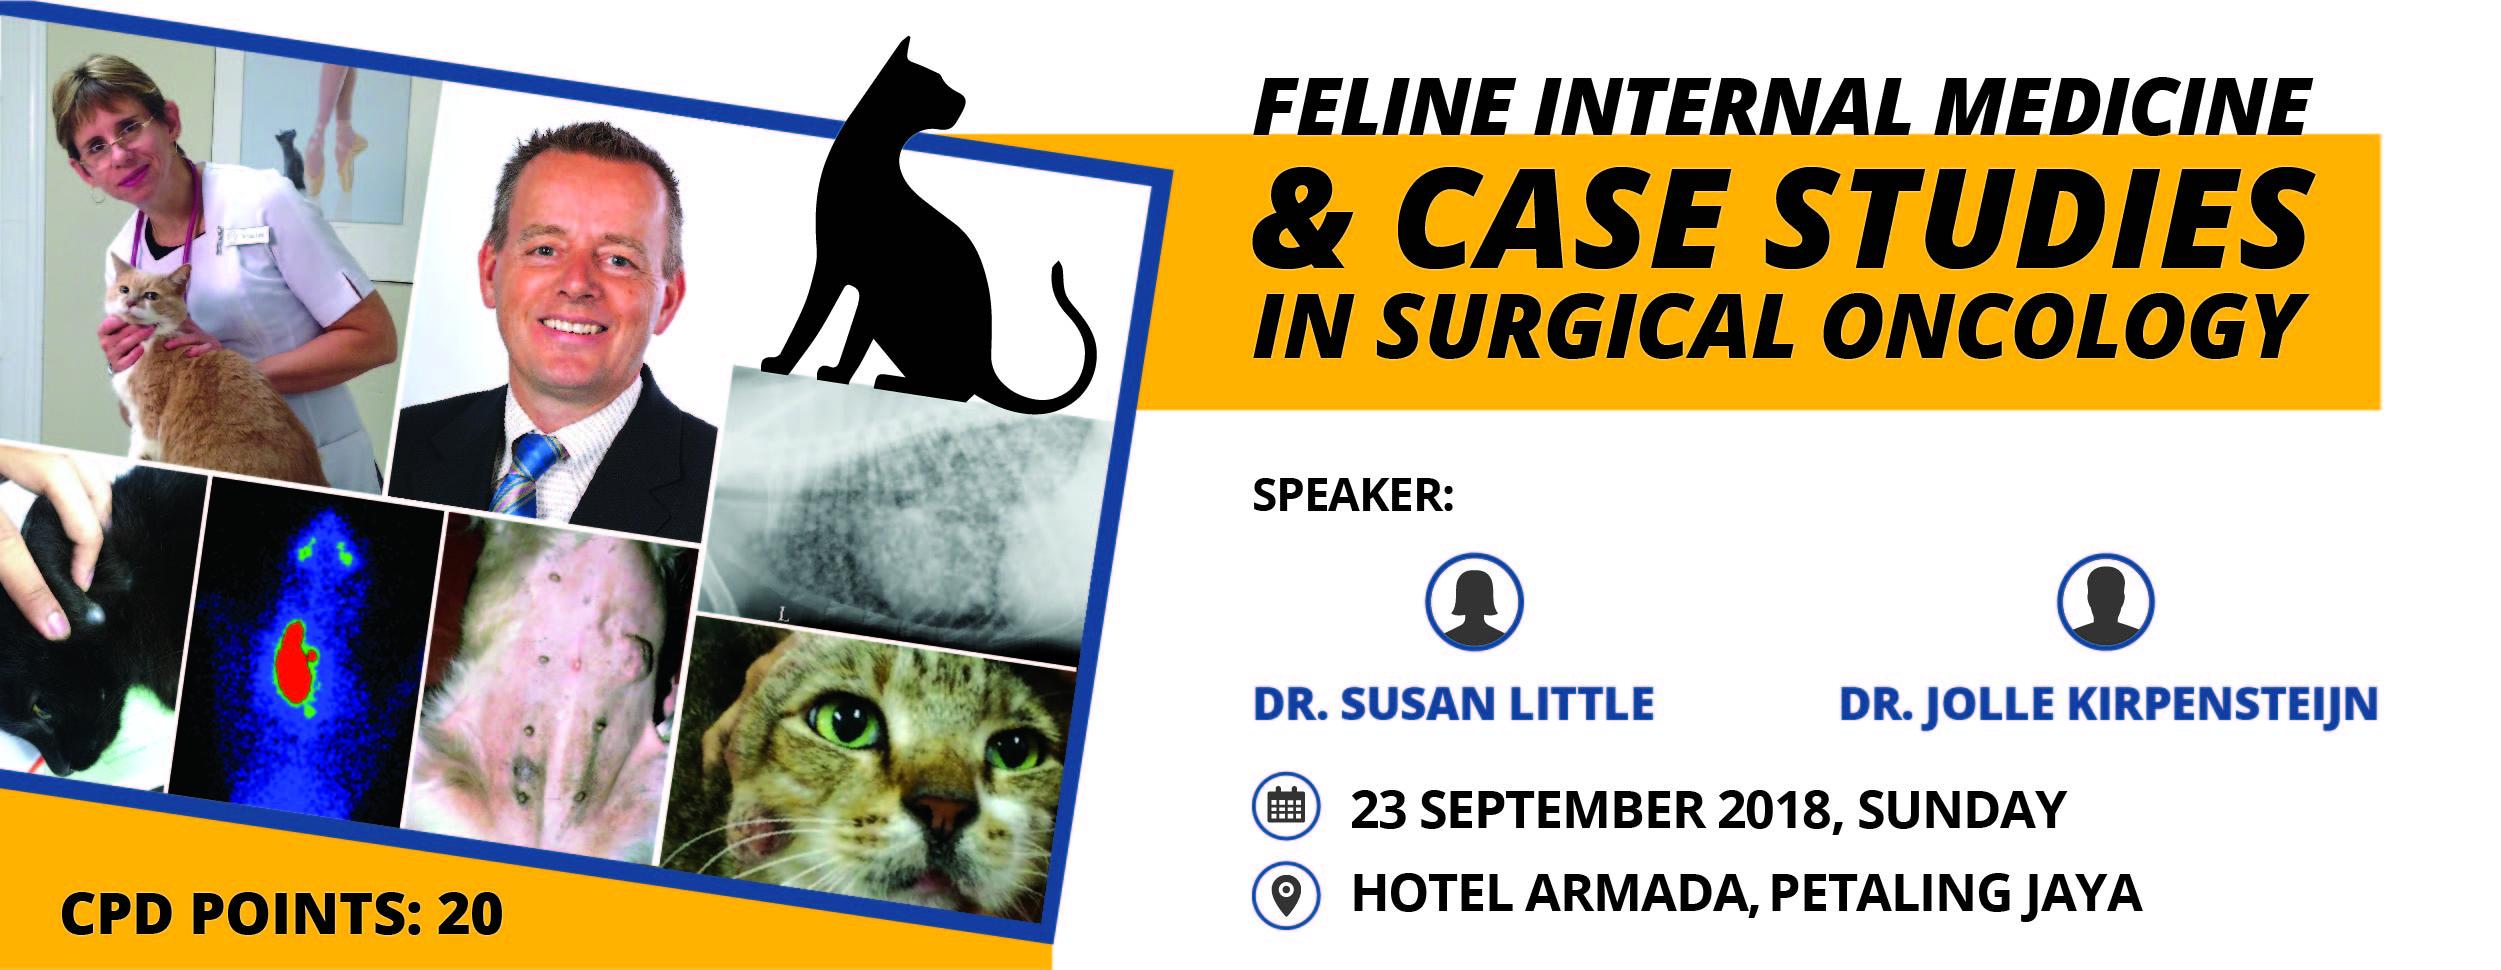 FELINE INTERNAL MEDICINE & CASE STUDIES IN SURGICAL ONCOLOGY